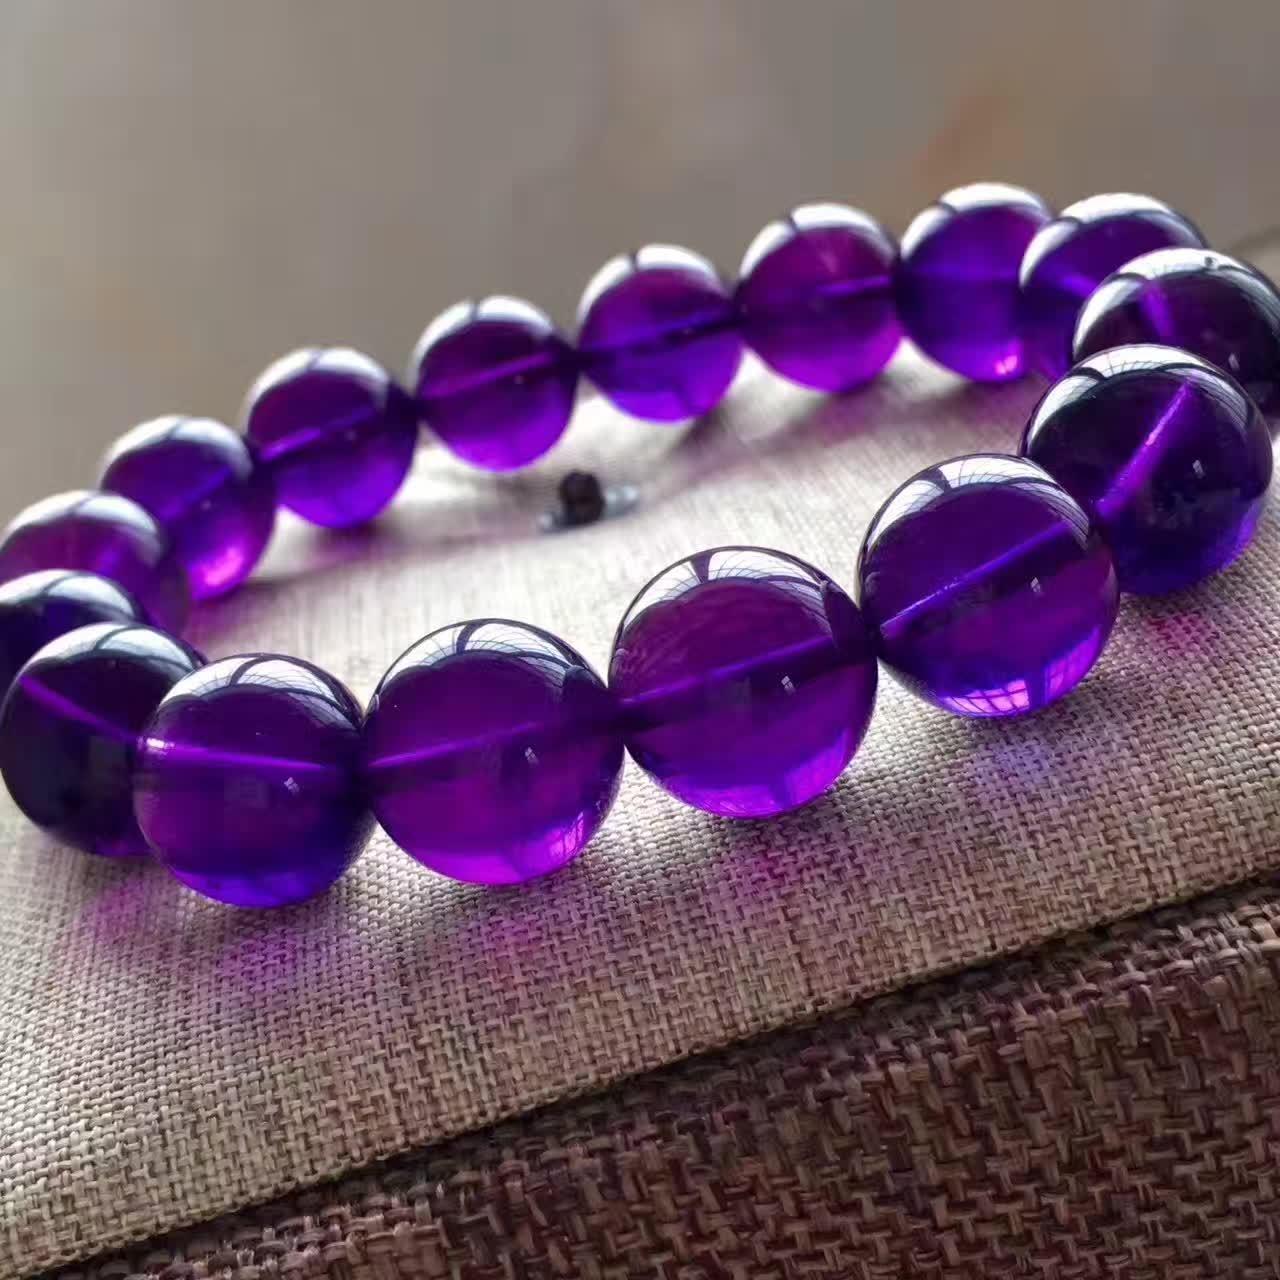 Natural Purple Amethyst Quartz Crystal Round Beads Bracelet 13mm AAA